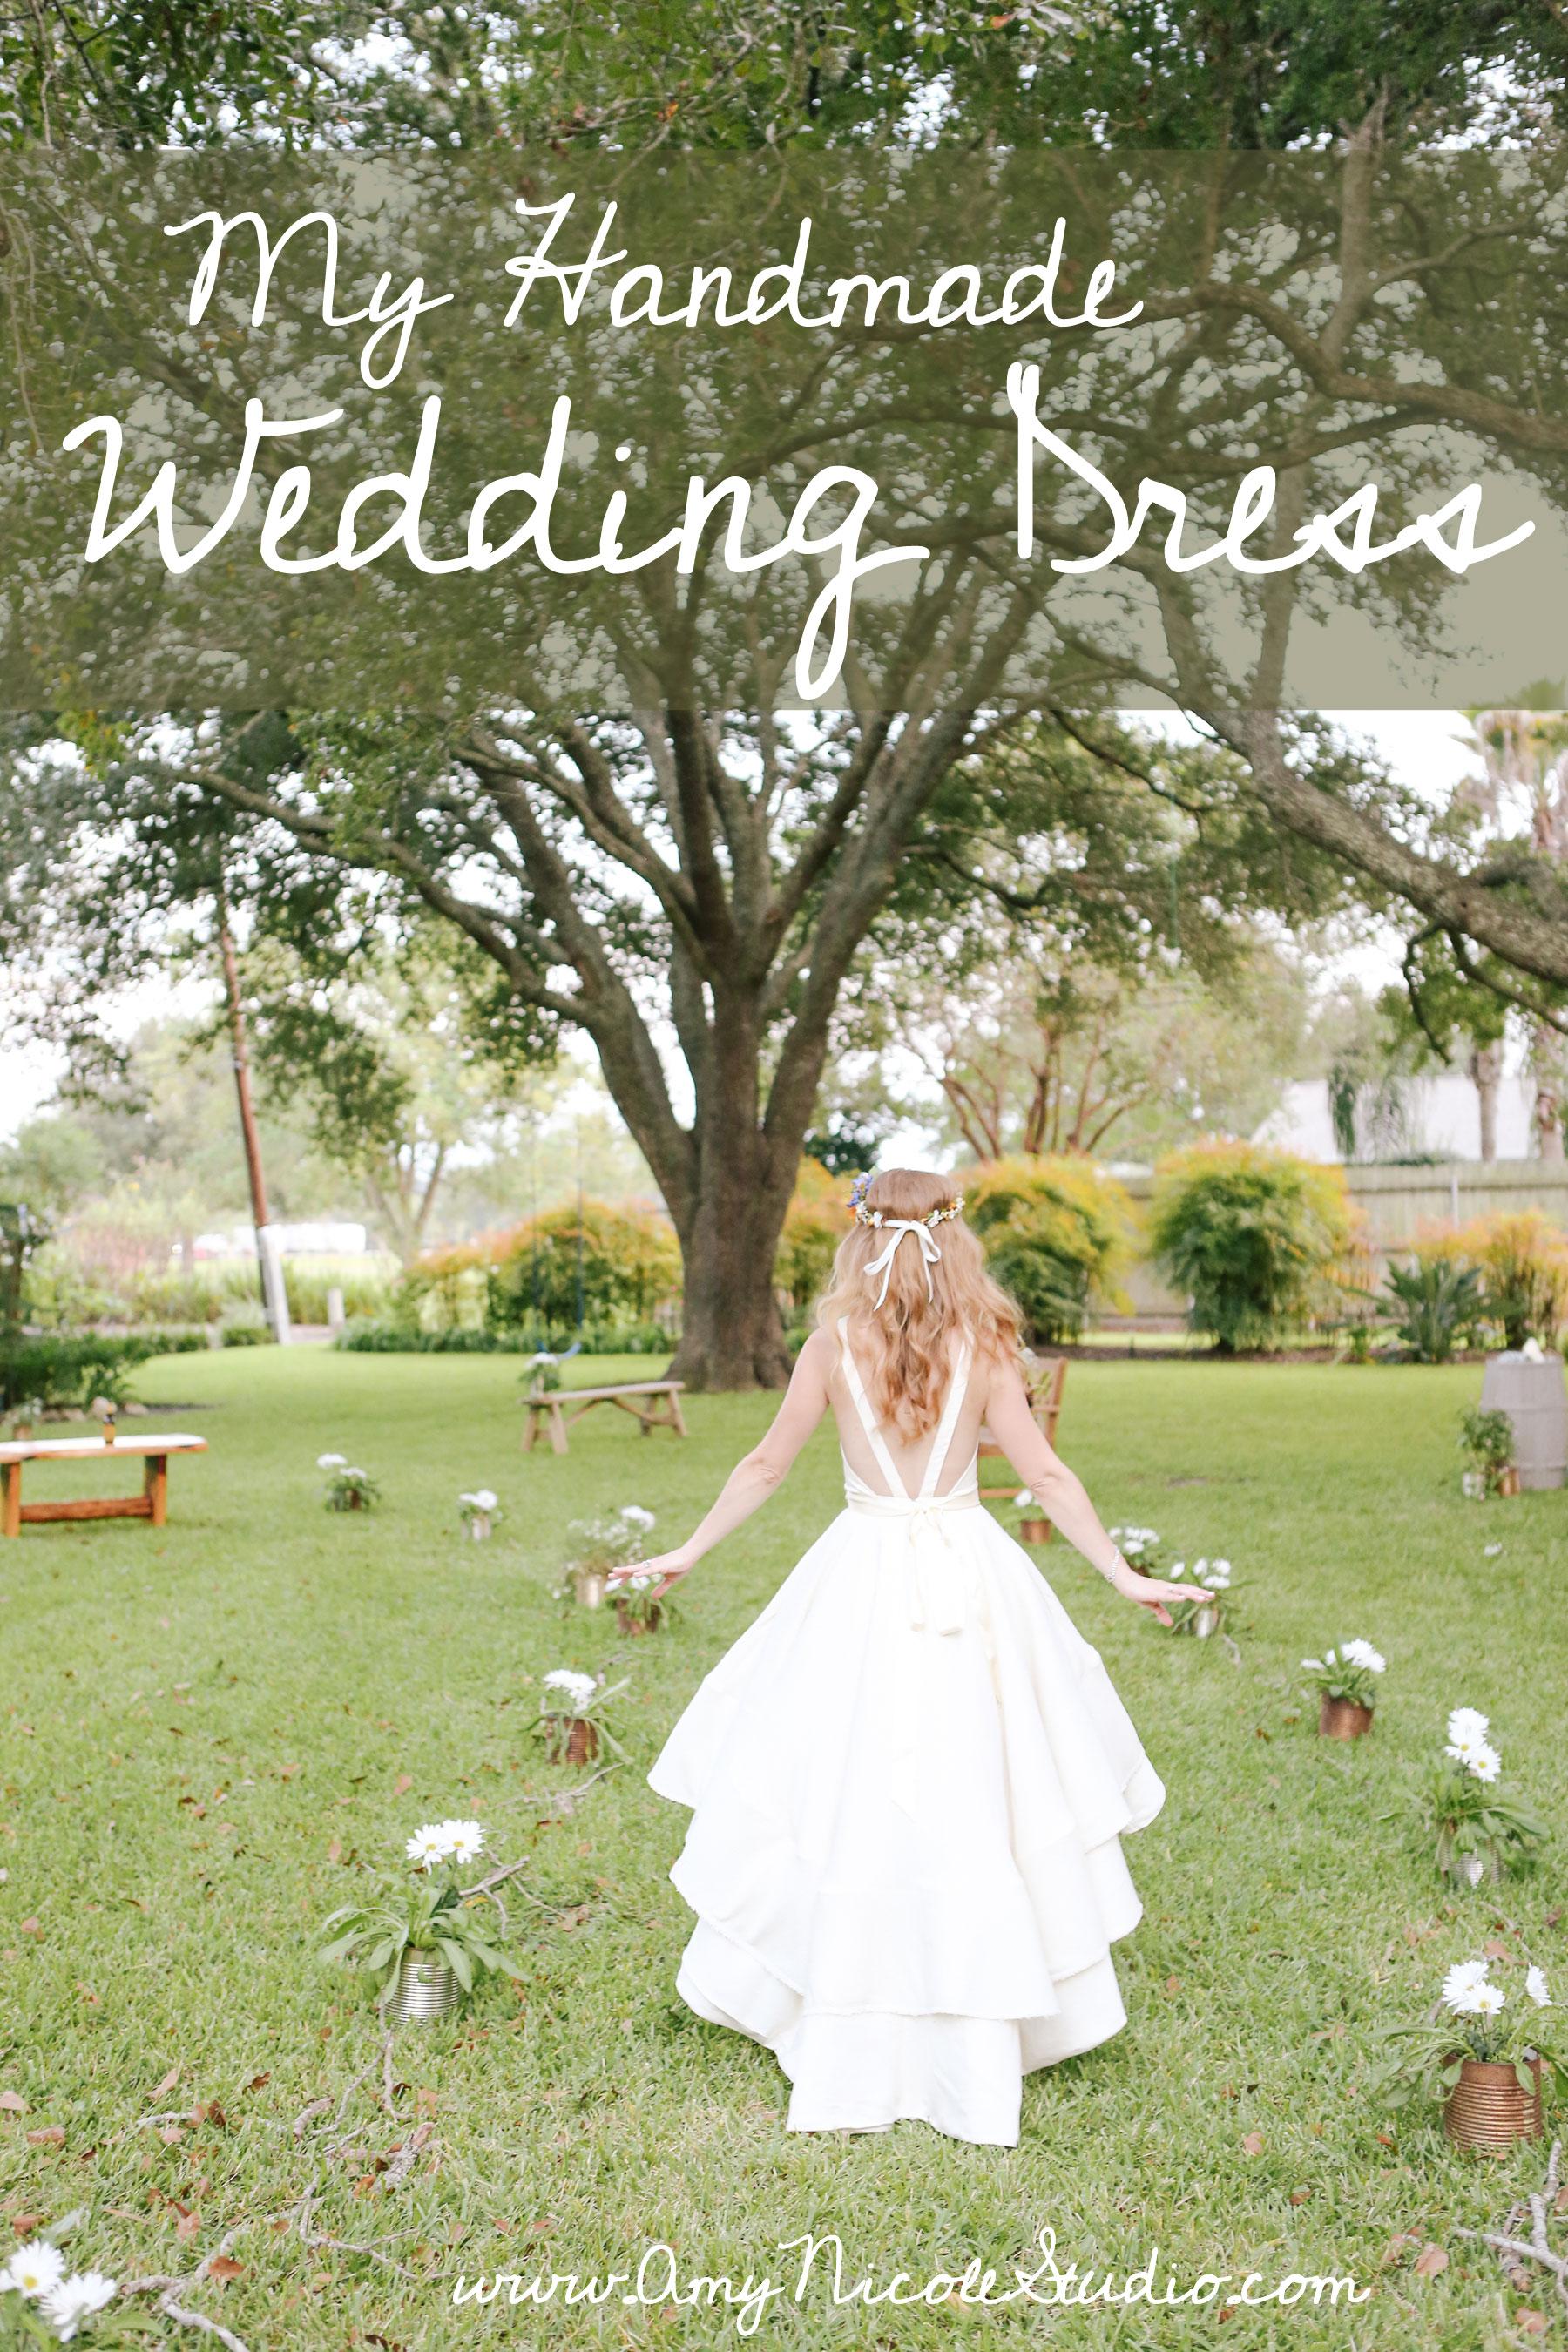 A Handmade Wedding Dress – Amy Nicole Studio